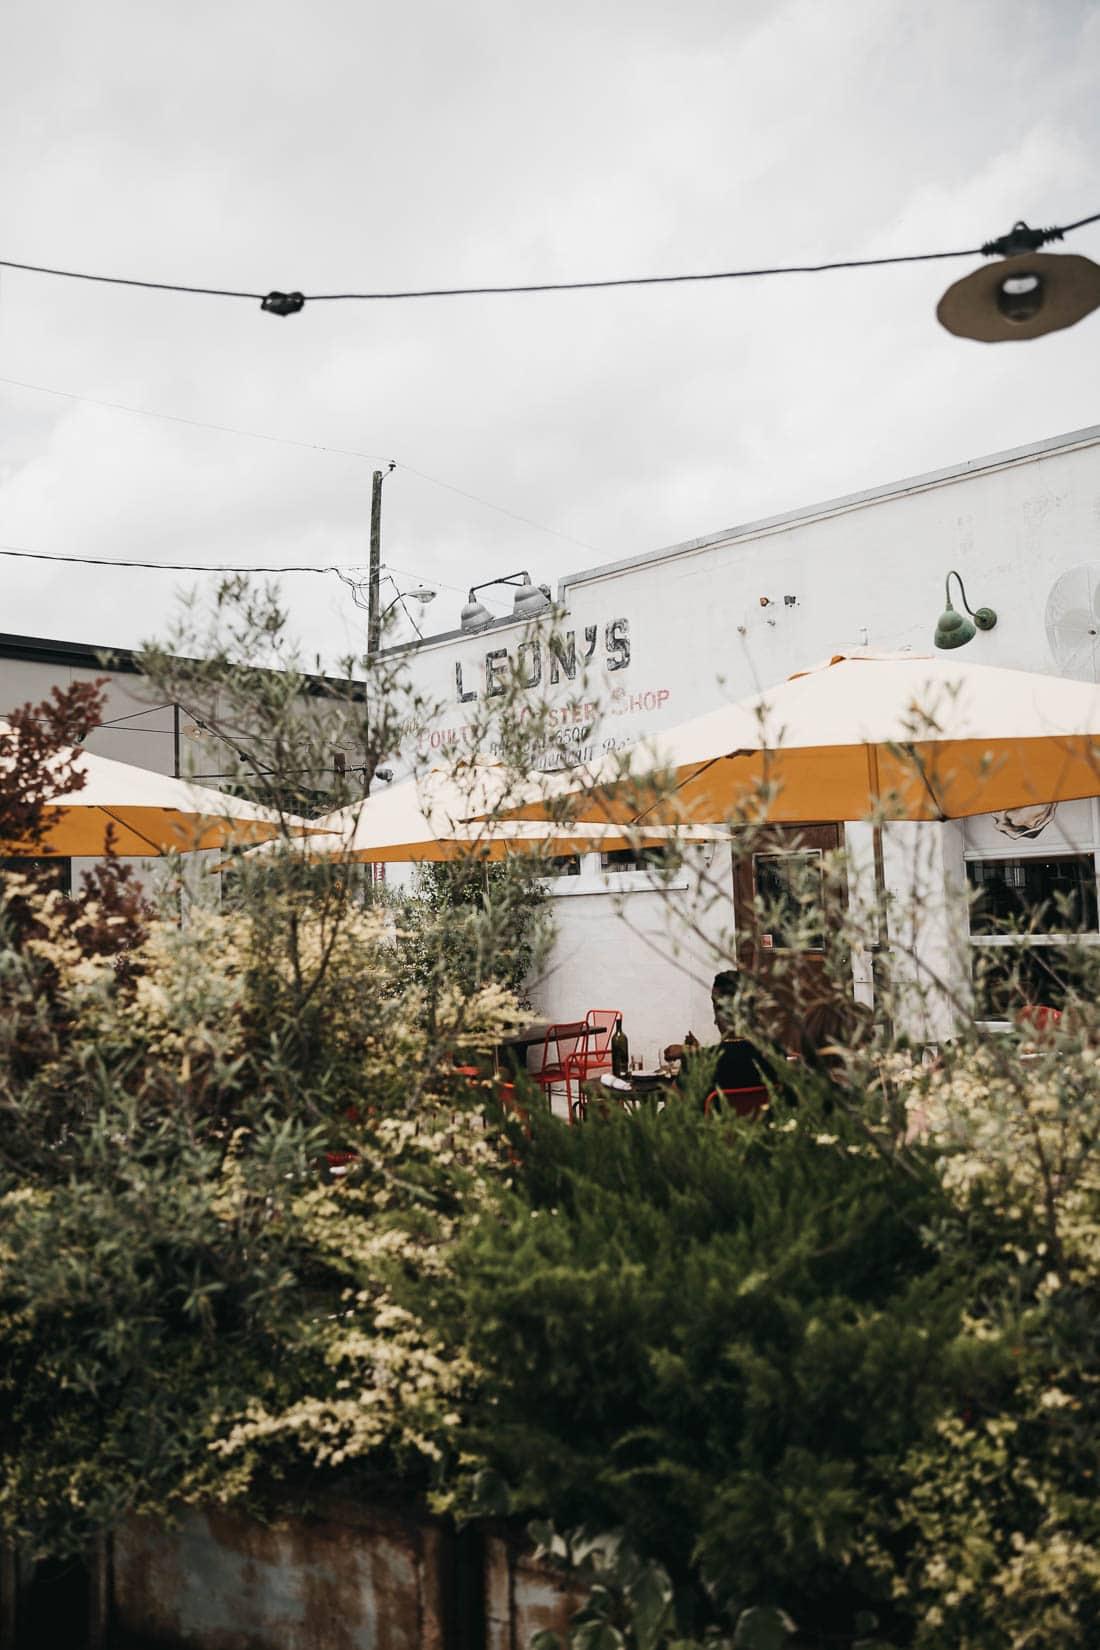 Leon's Oyster Bar